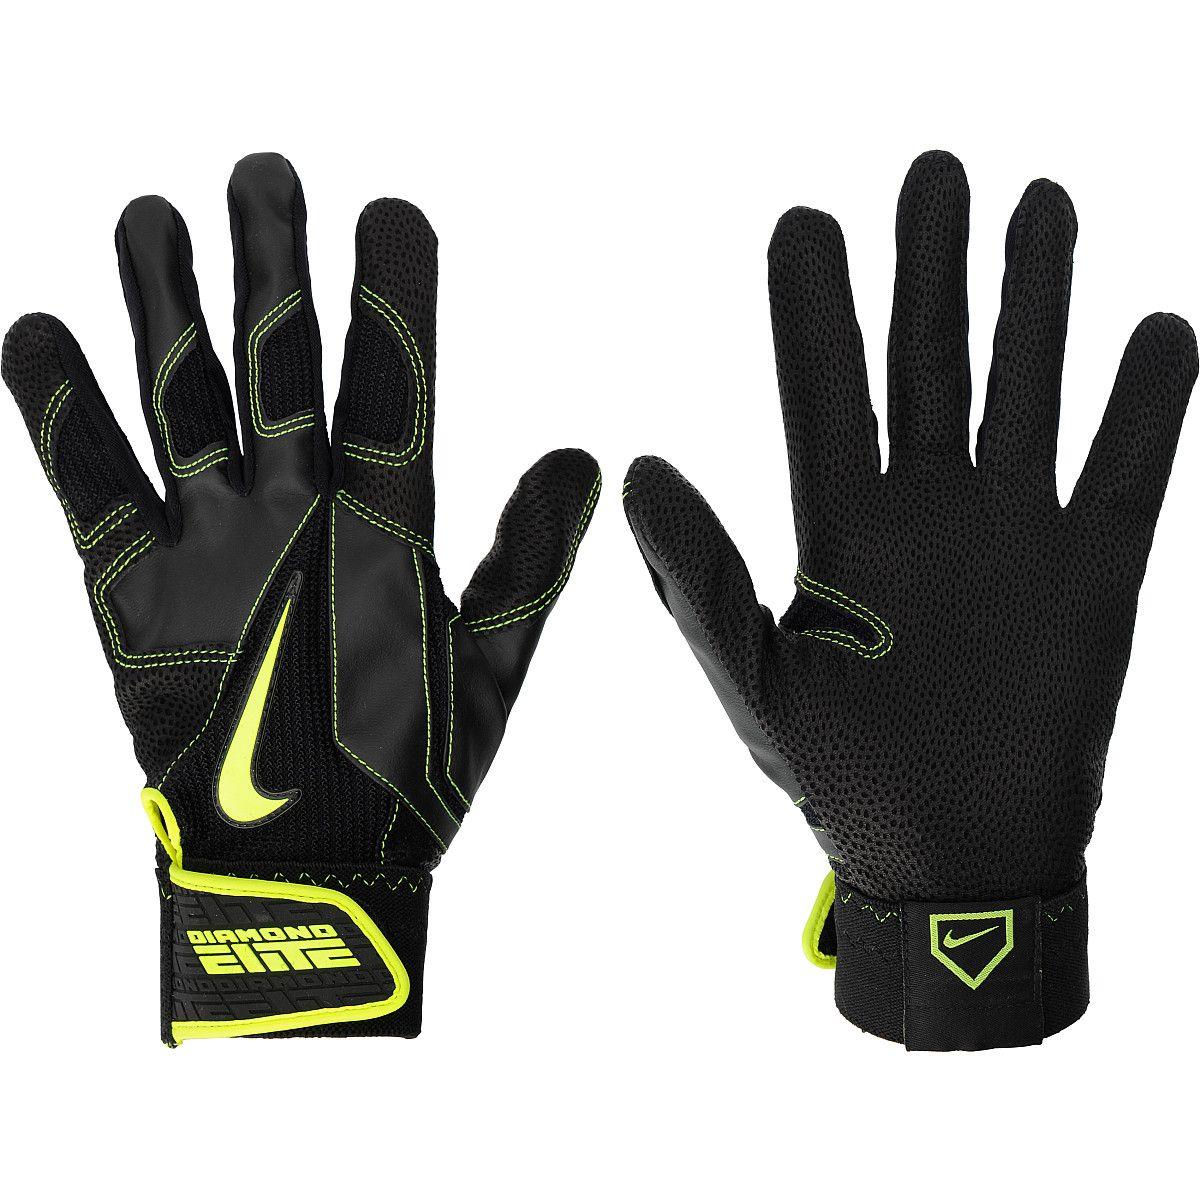 Black leather batting gloves - Nike Diamond Elite Pro Adult Baseball Batting Gloves Sportsauthority Com